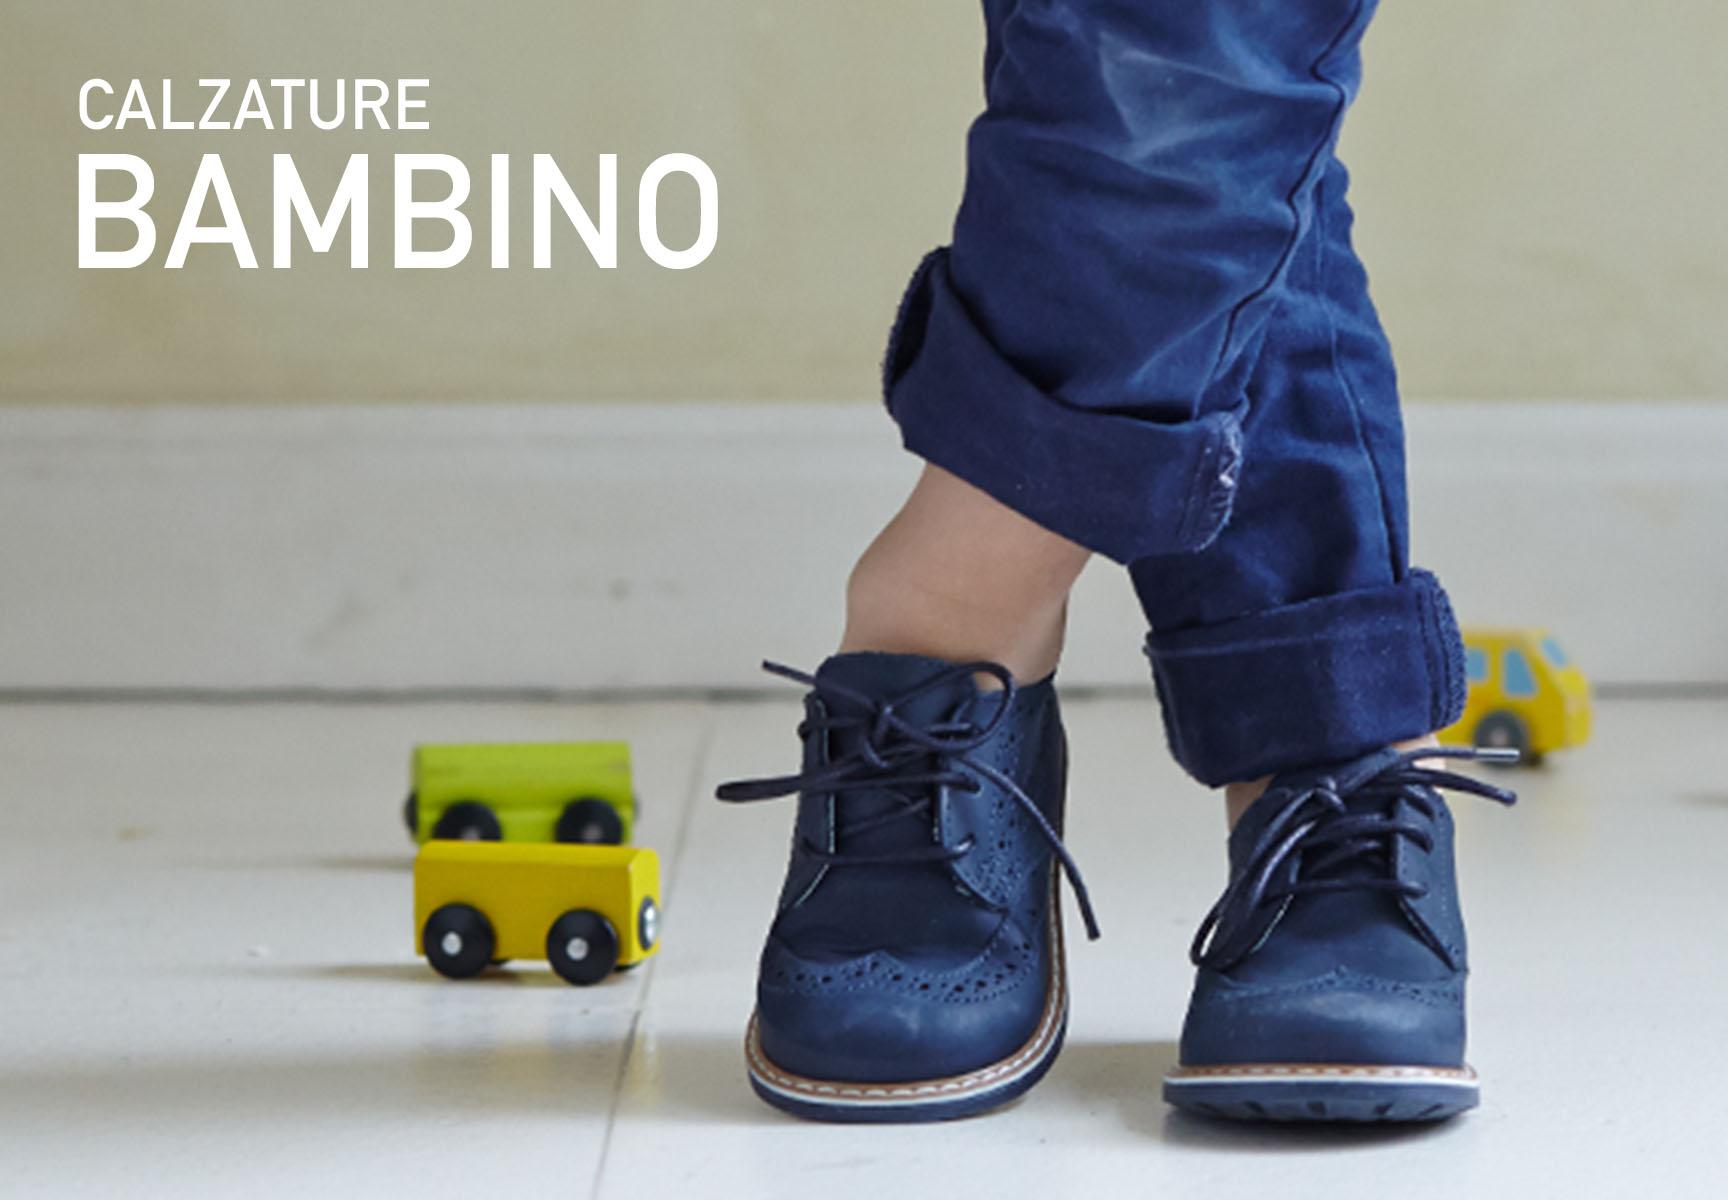 Calzature Bambino – ABM Calzature